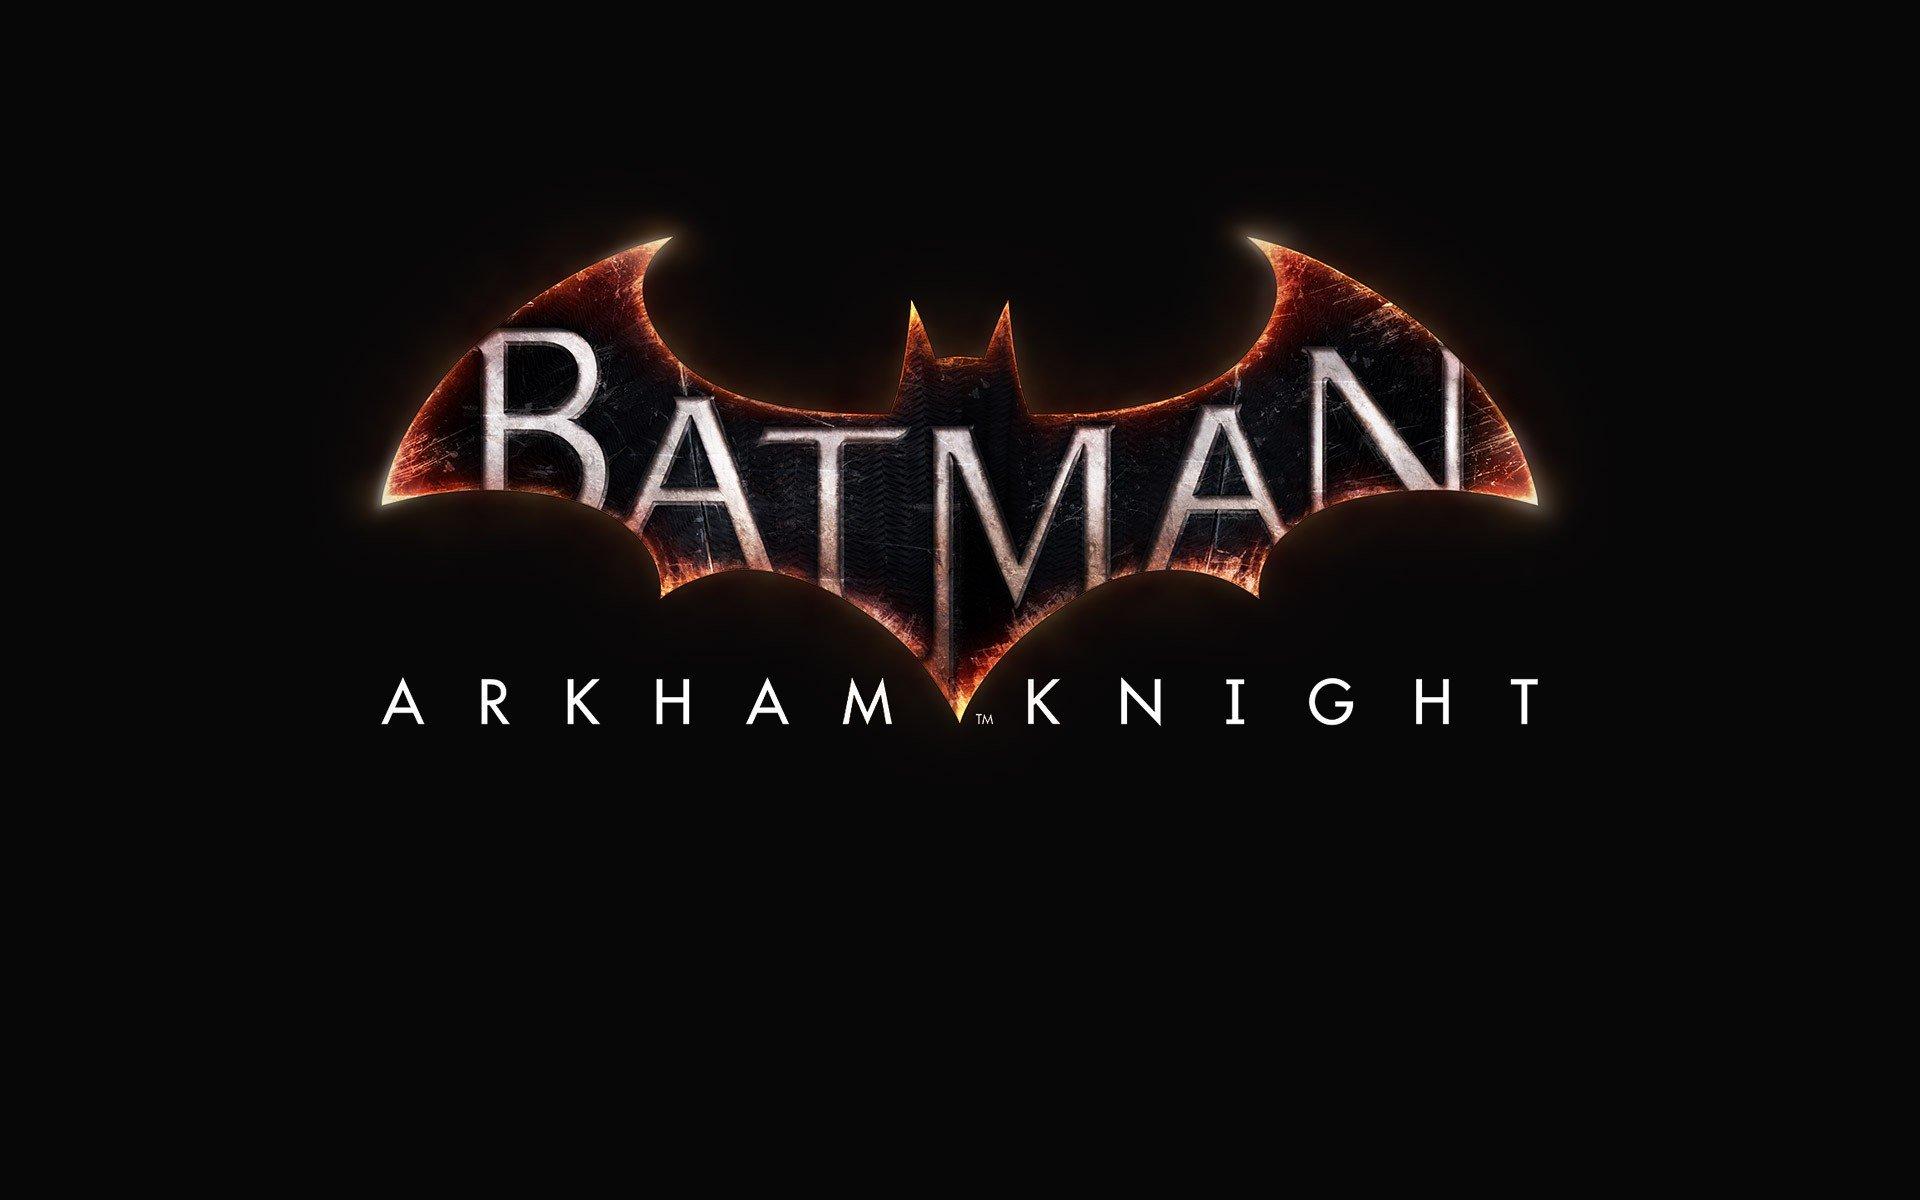 Batman Logo Symbol Wallpapers HD For Desktop Backgrounds